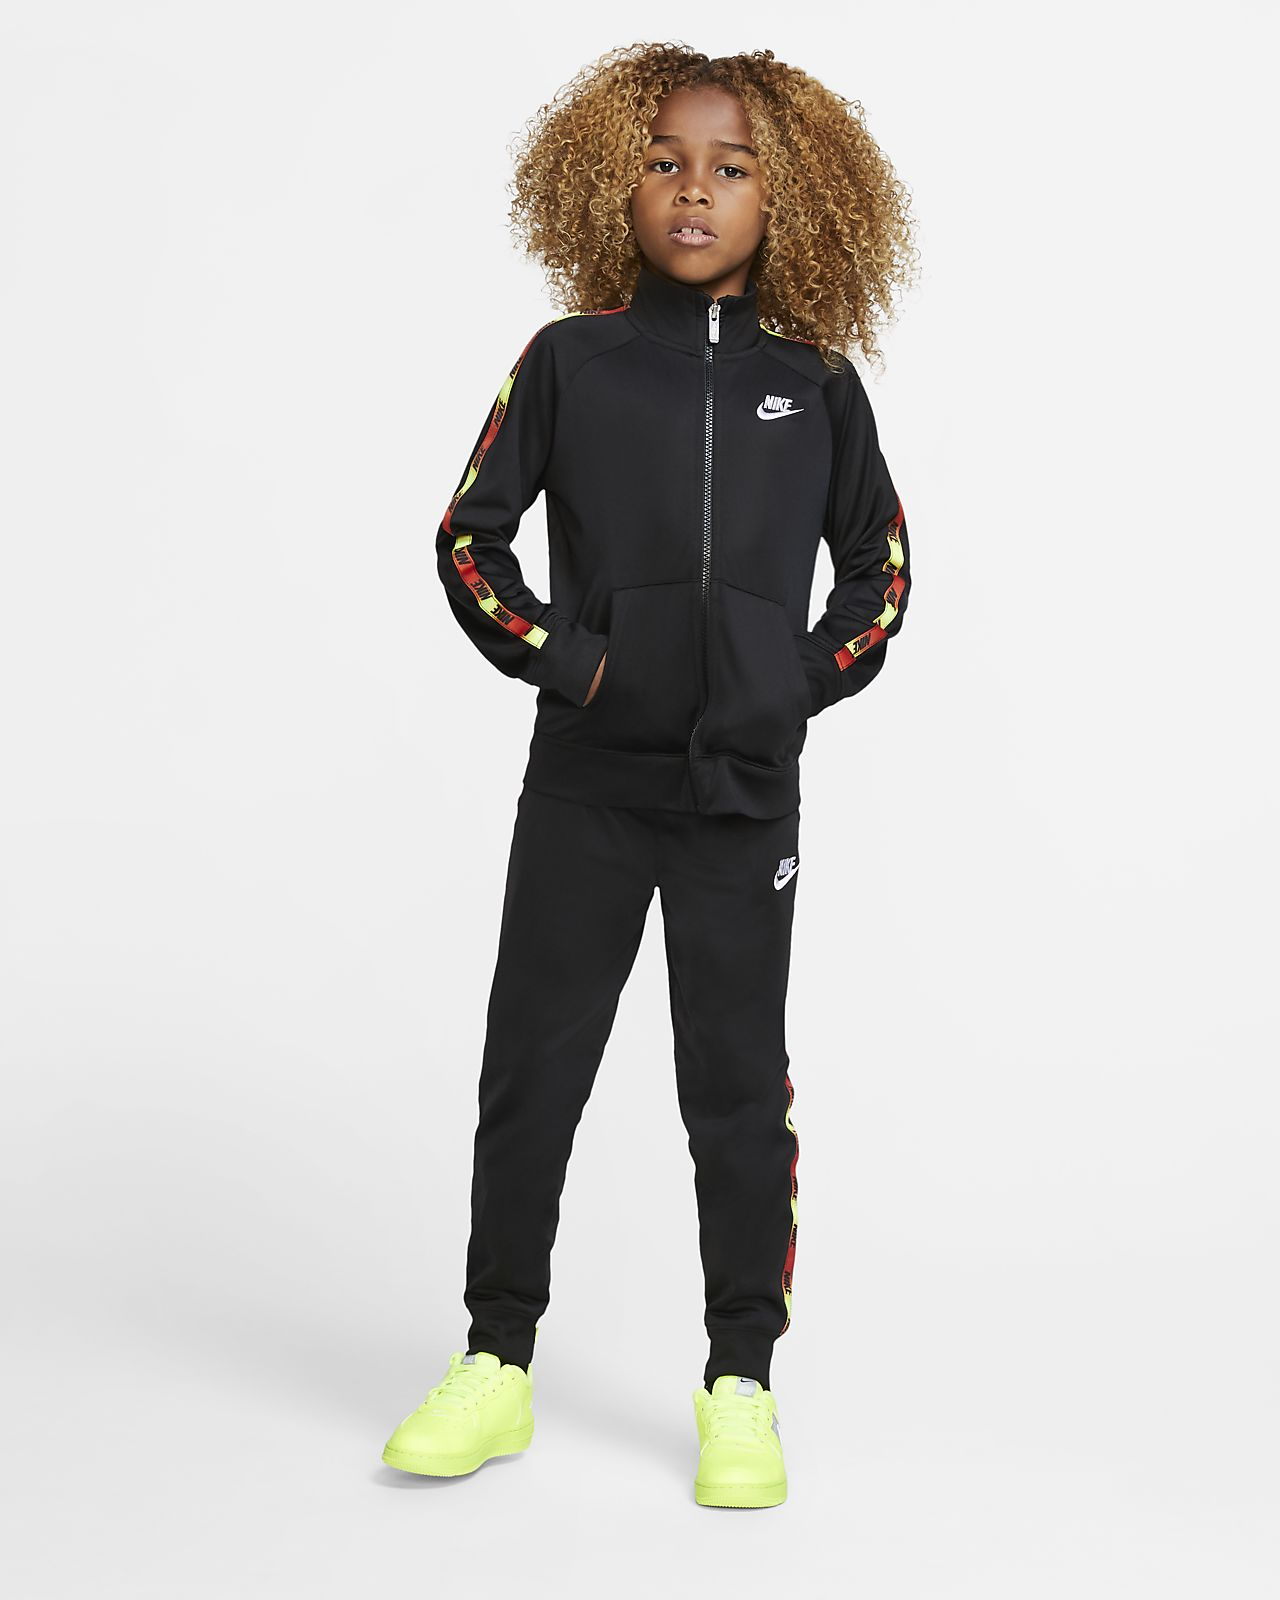 Nike 幼童运动套装